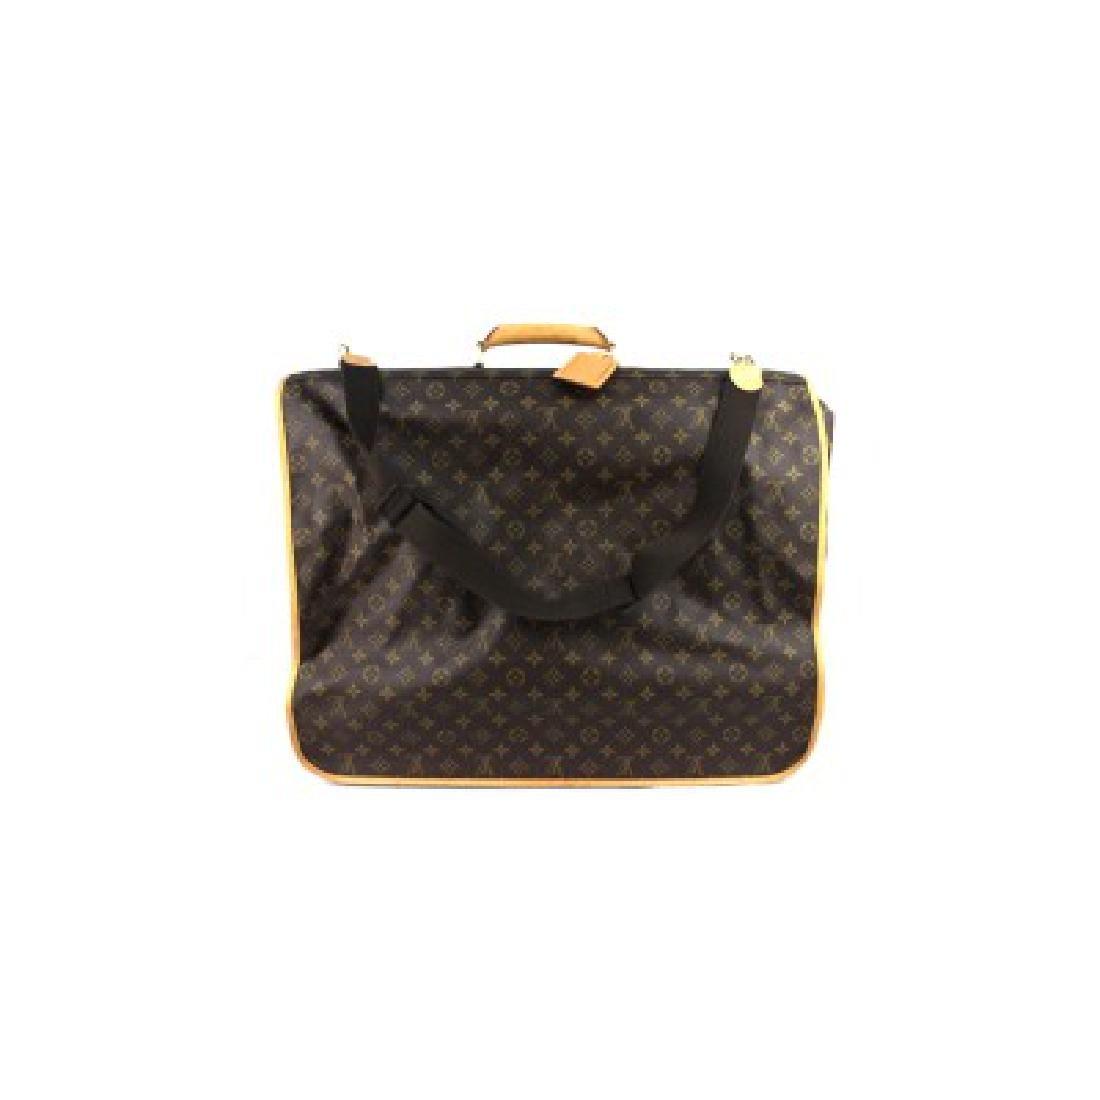 Louis Vuitton Travel Garment Bag Monogram